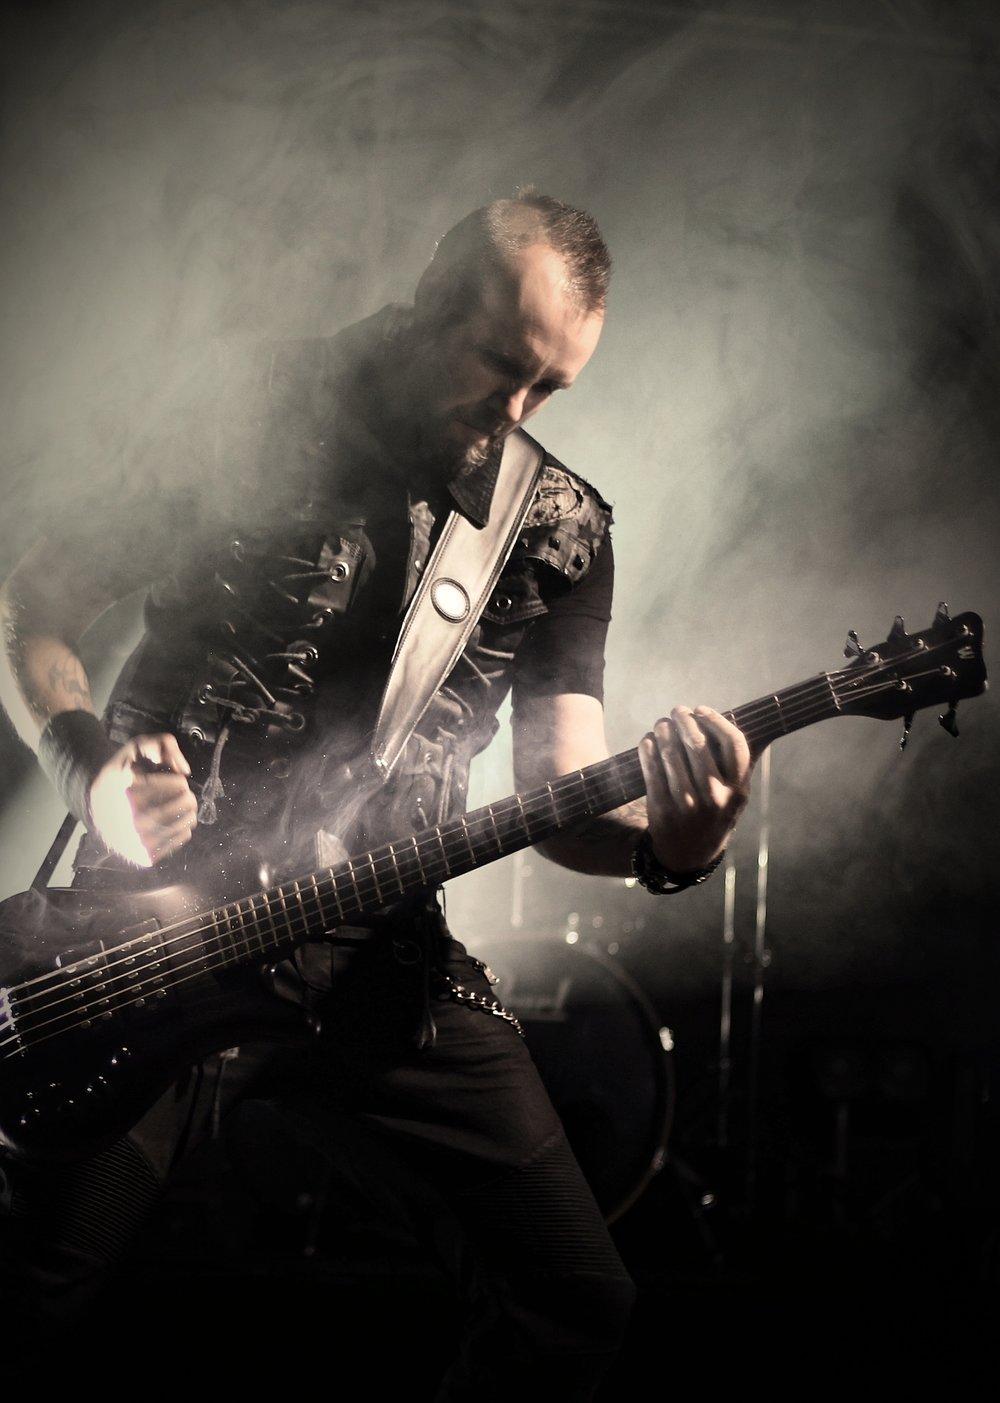 Lars - Bass